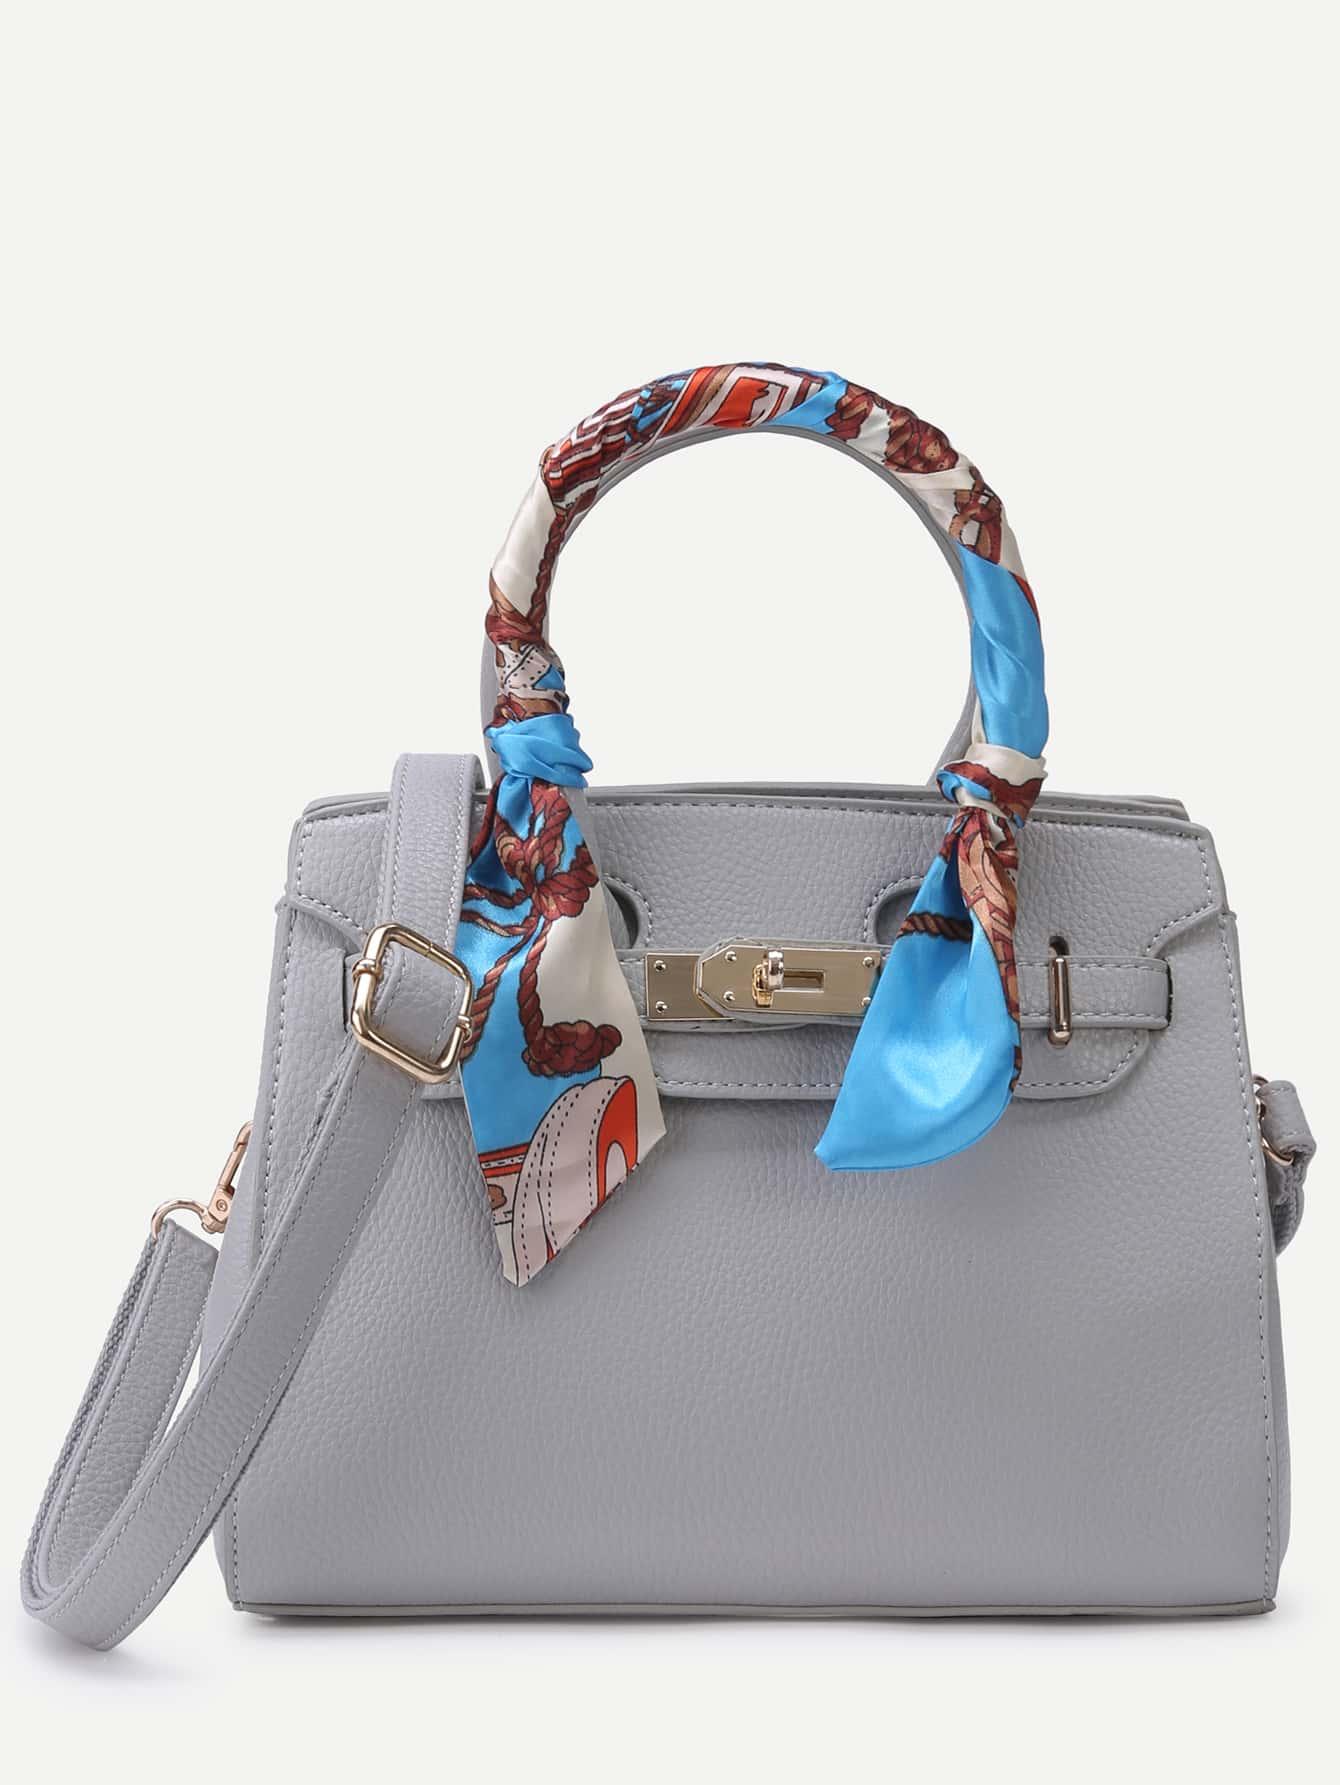 bag160909914_2